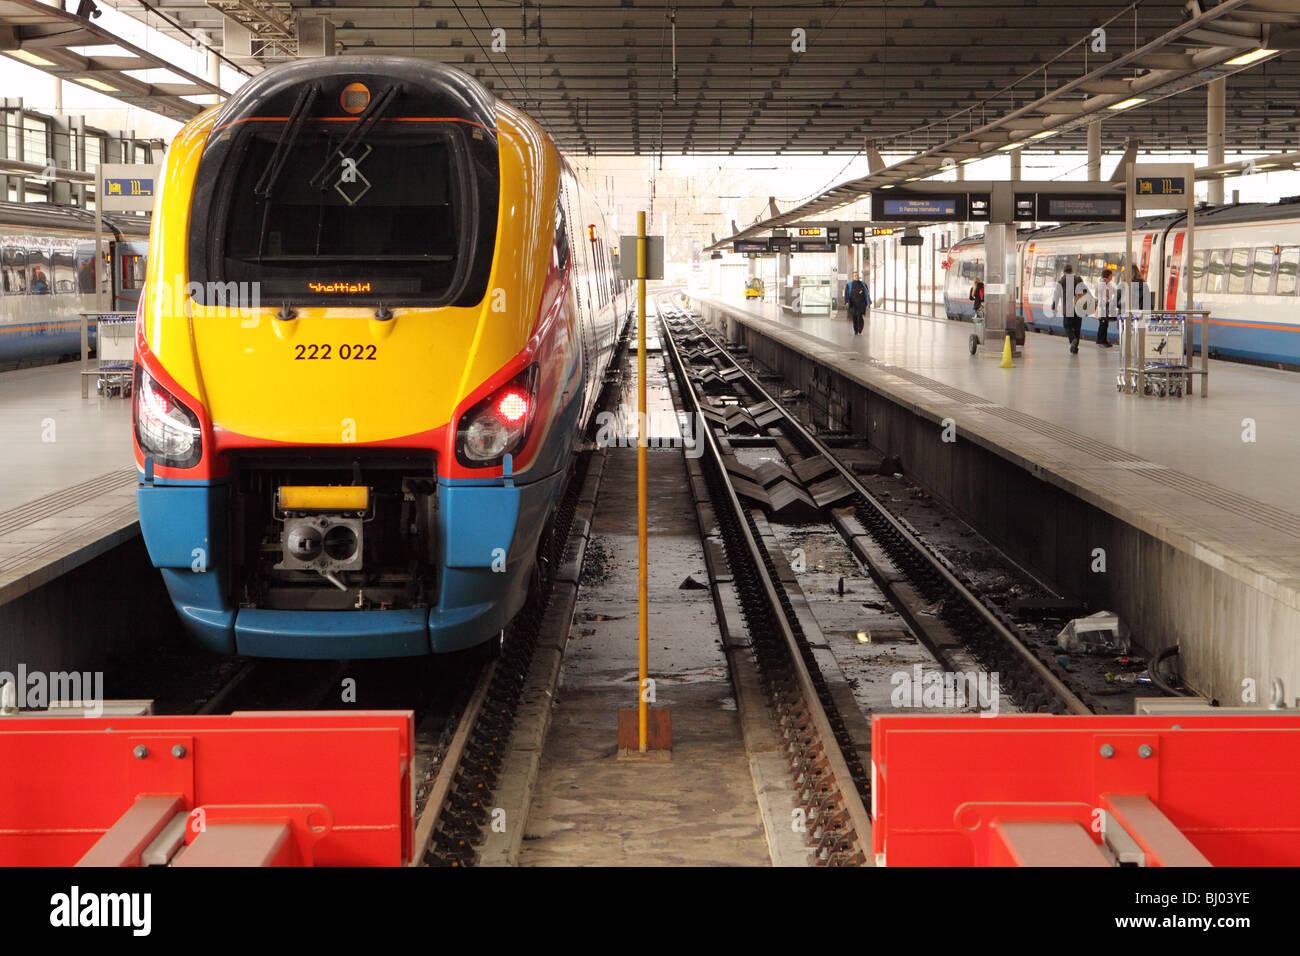 St Pancras railway station London Class 222 locomotive of East Midlands Trains - Stock Image